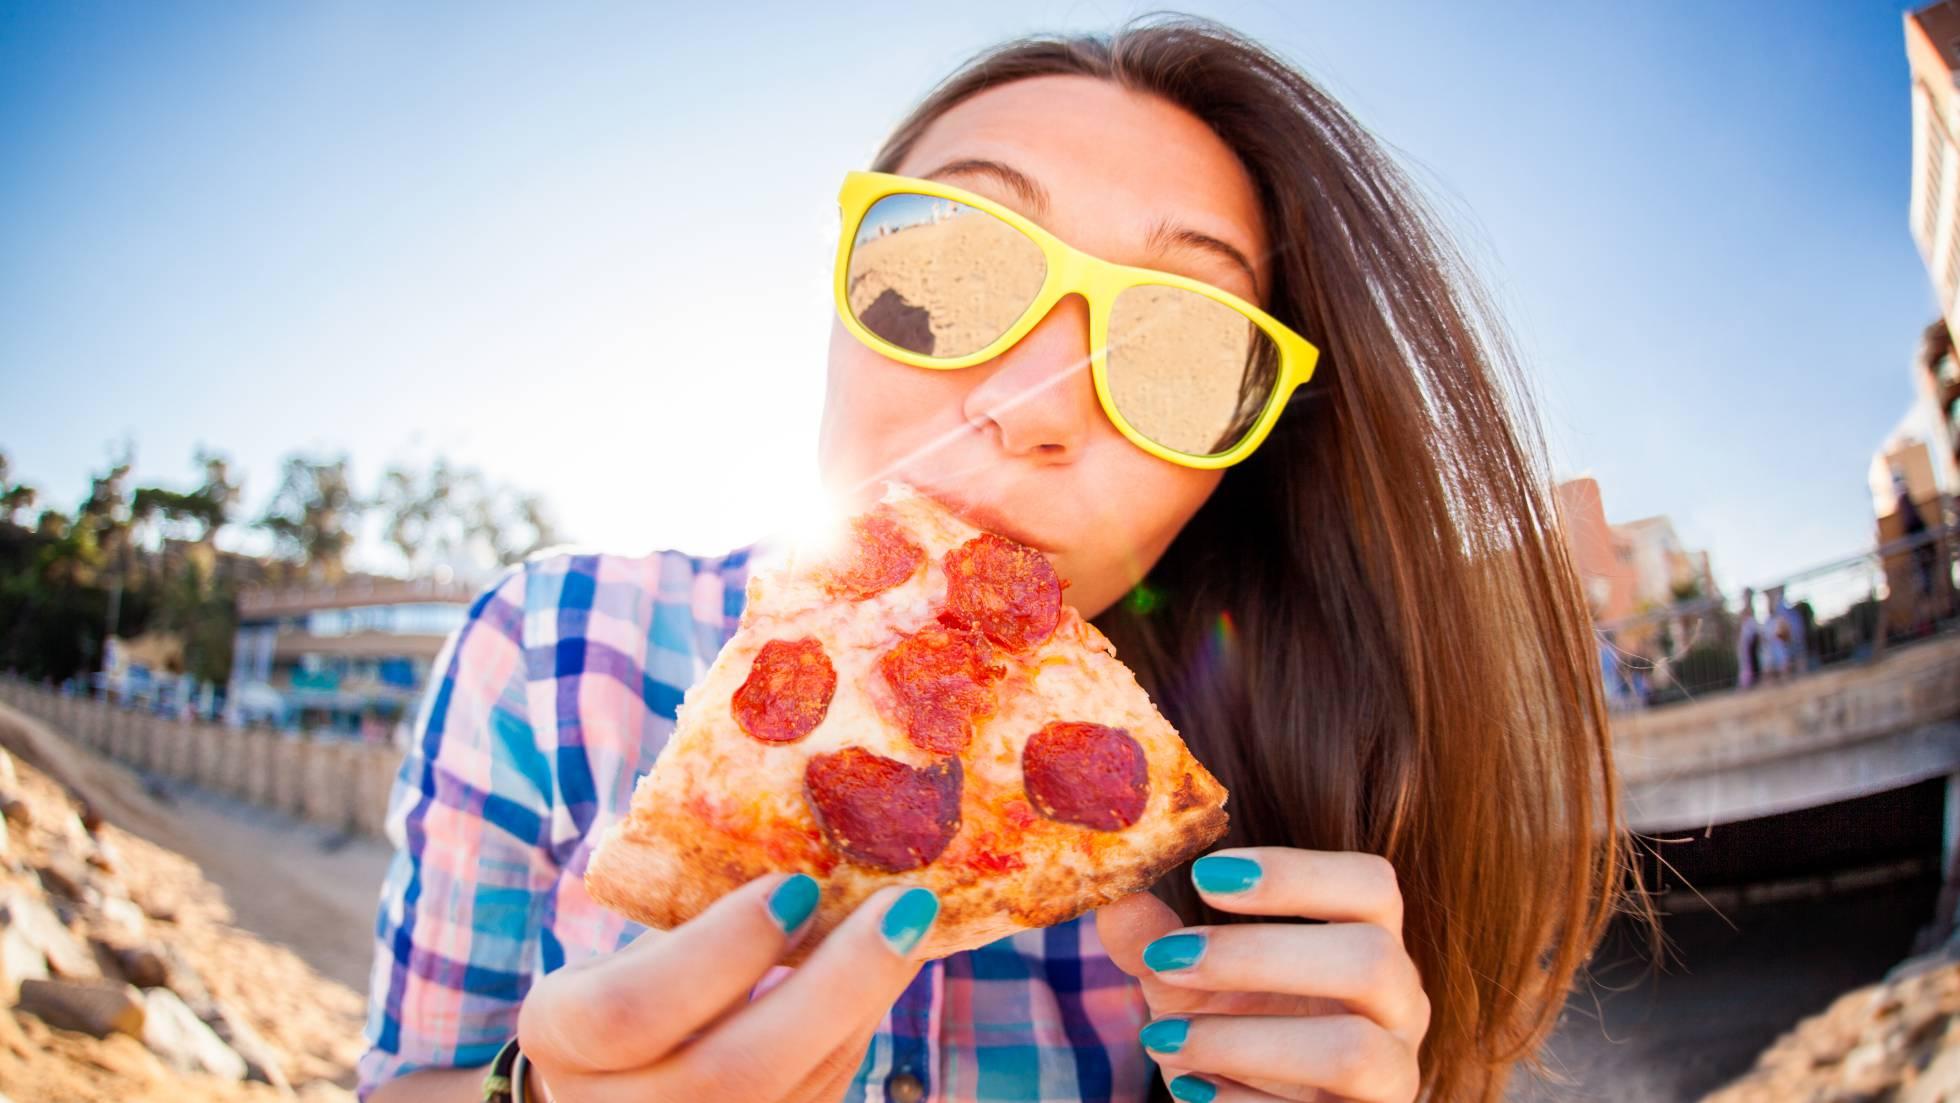 Vivís sola o solo, ¿te alimentas bien?